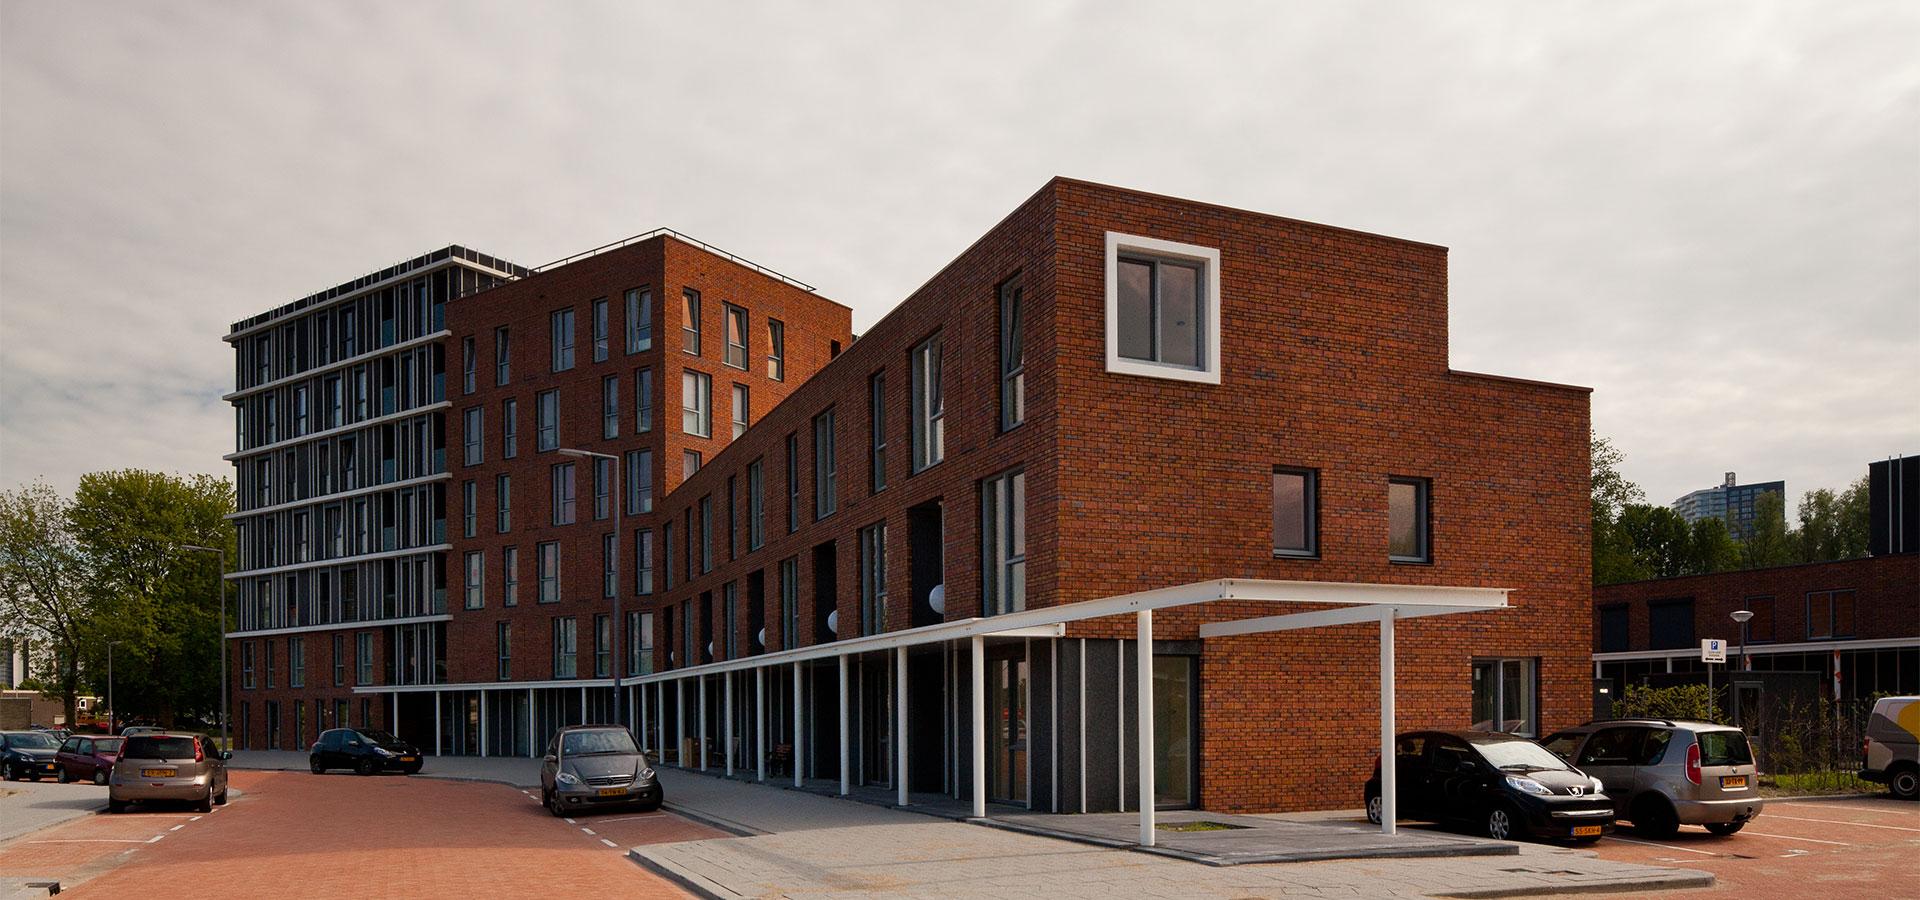 FARO architecten Dijkzone Oedevlietsepark Rotterdam 02